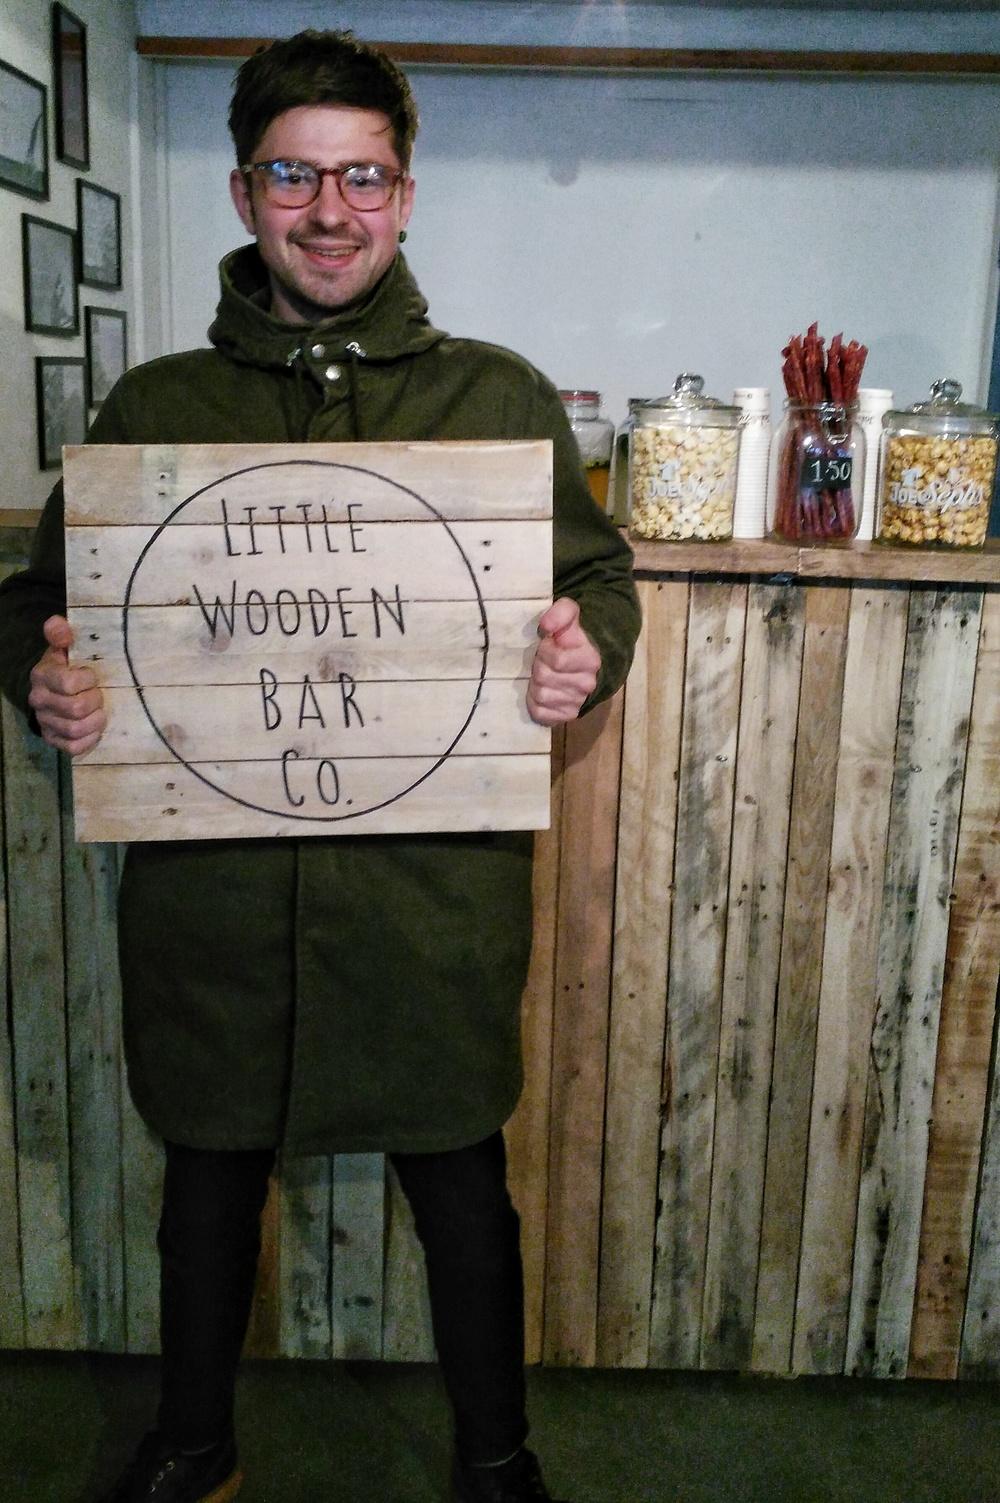 Matt posing with our bar sign...